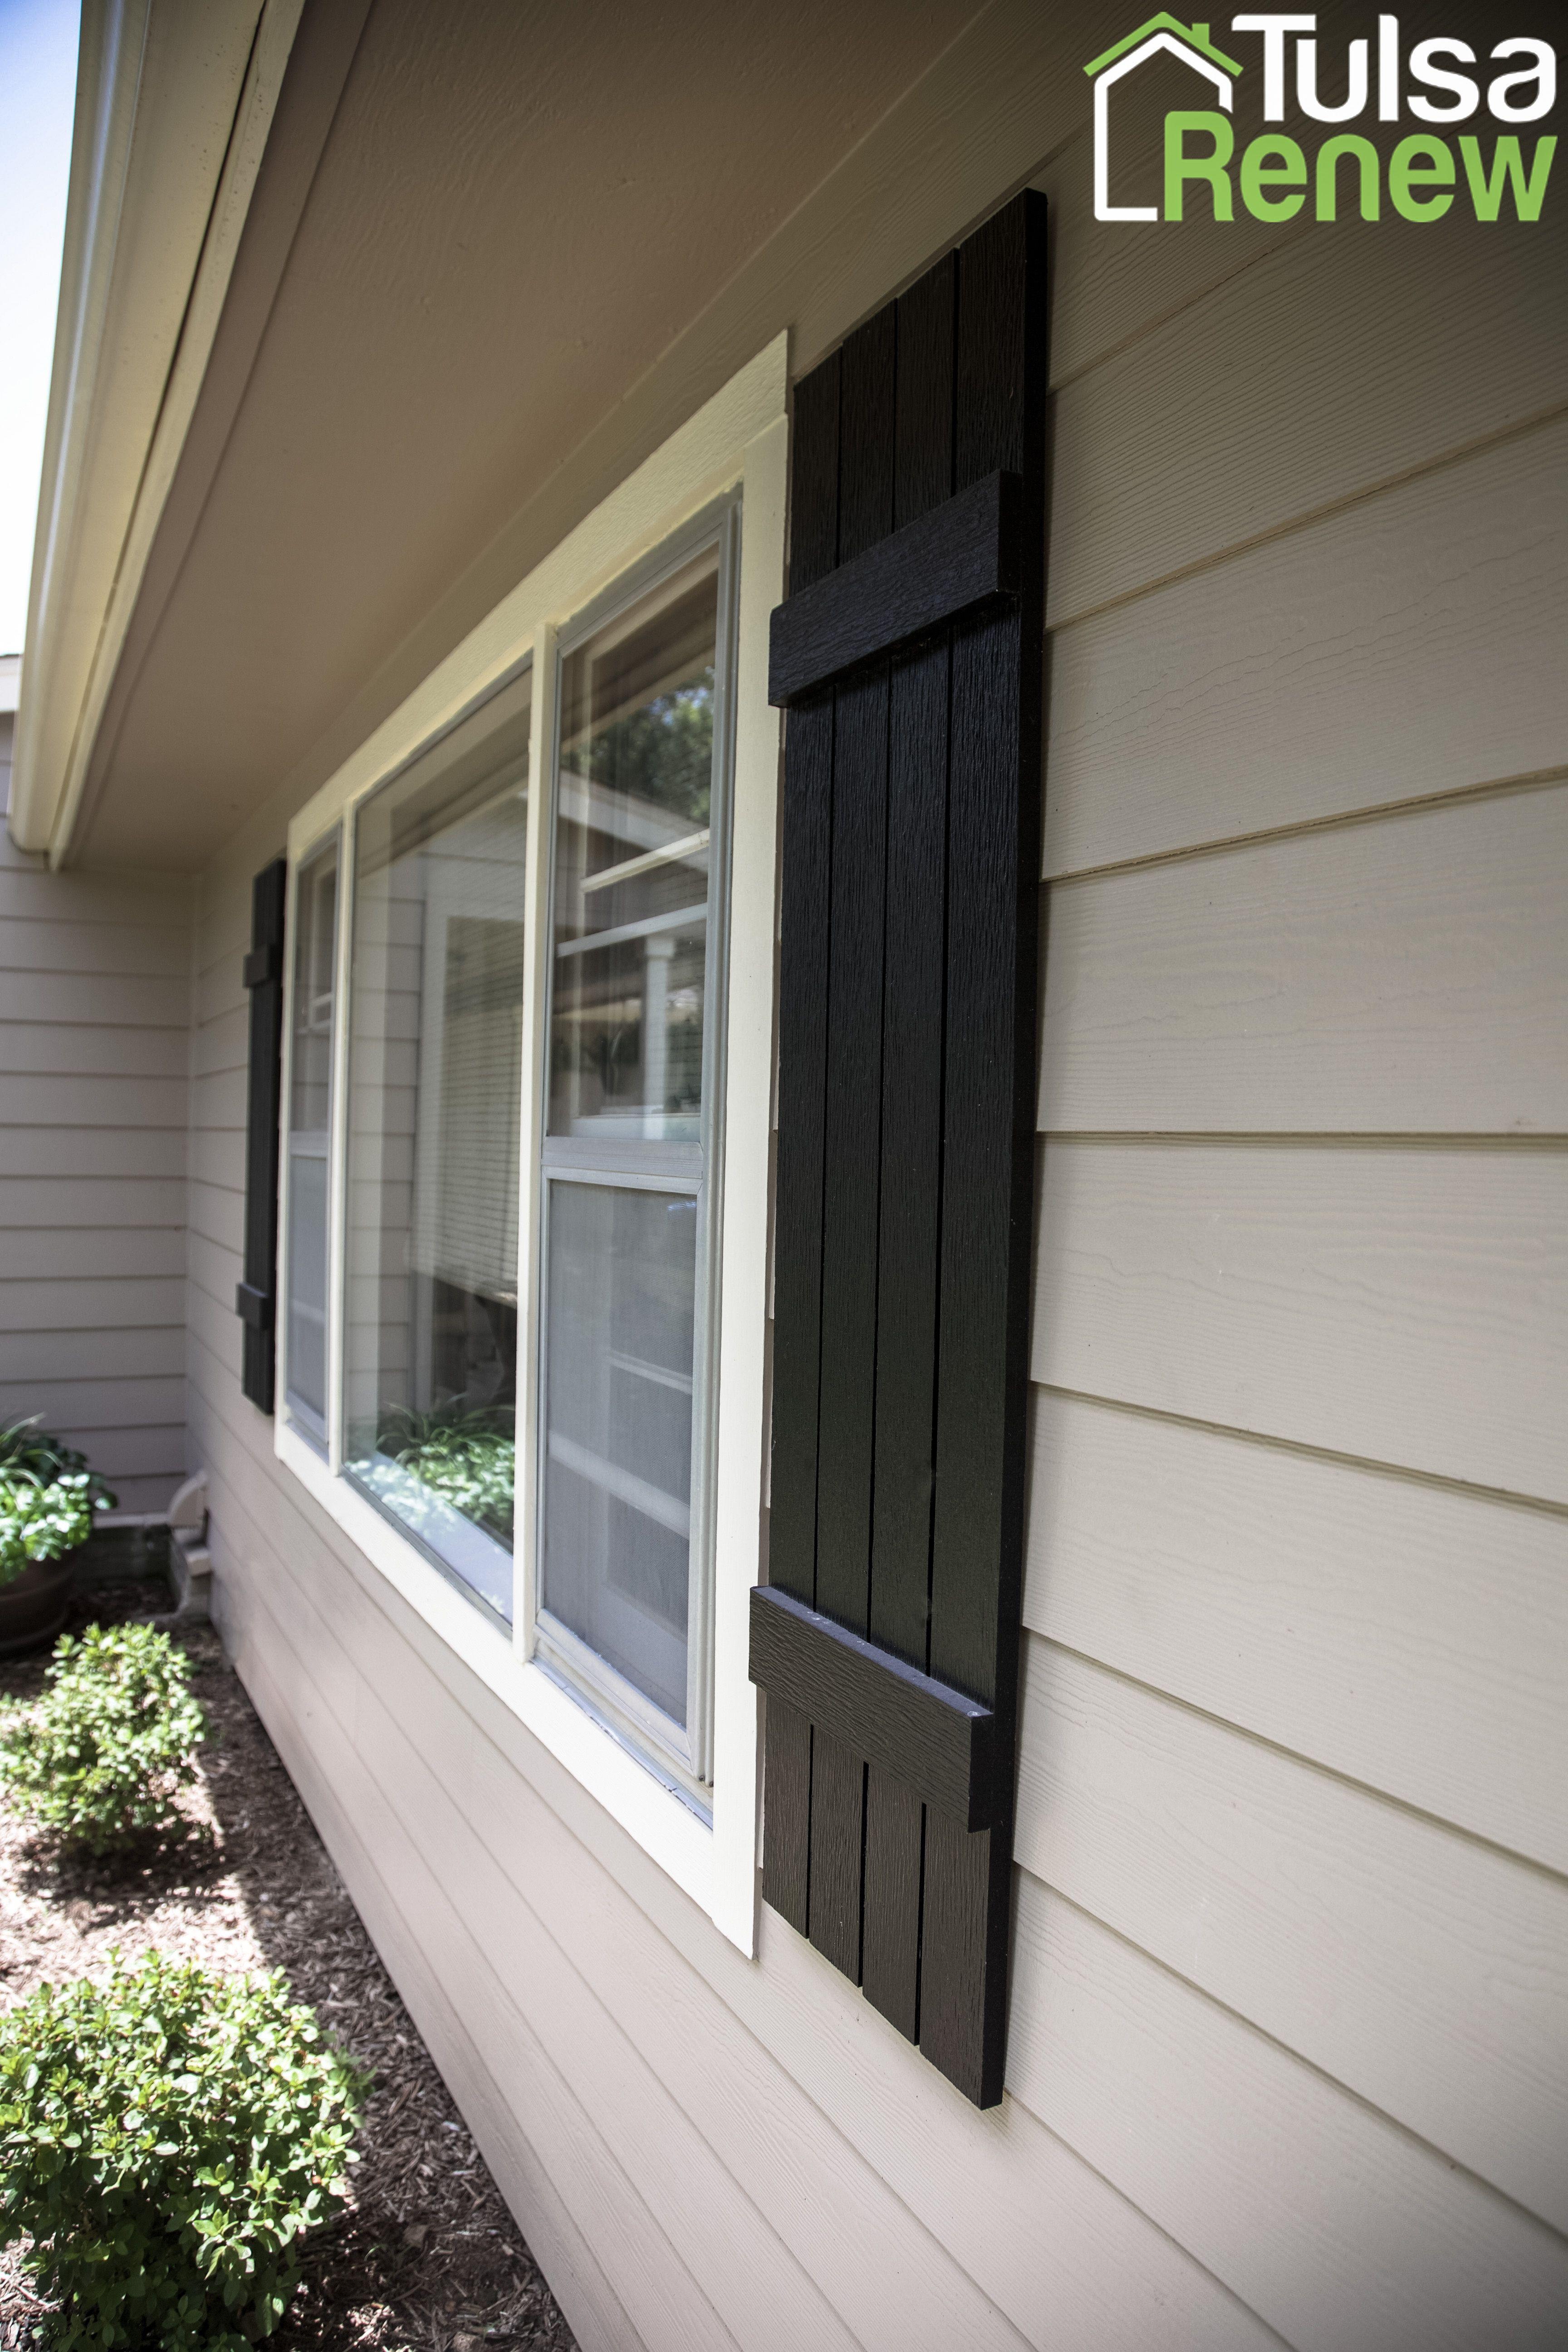 james hardie shutters with sherwin williams tricorn black accents tulsarenew details design. Black Bedroom Furniture Sets. Home Design Ideas